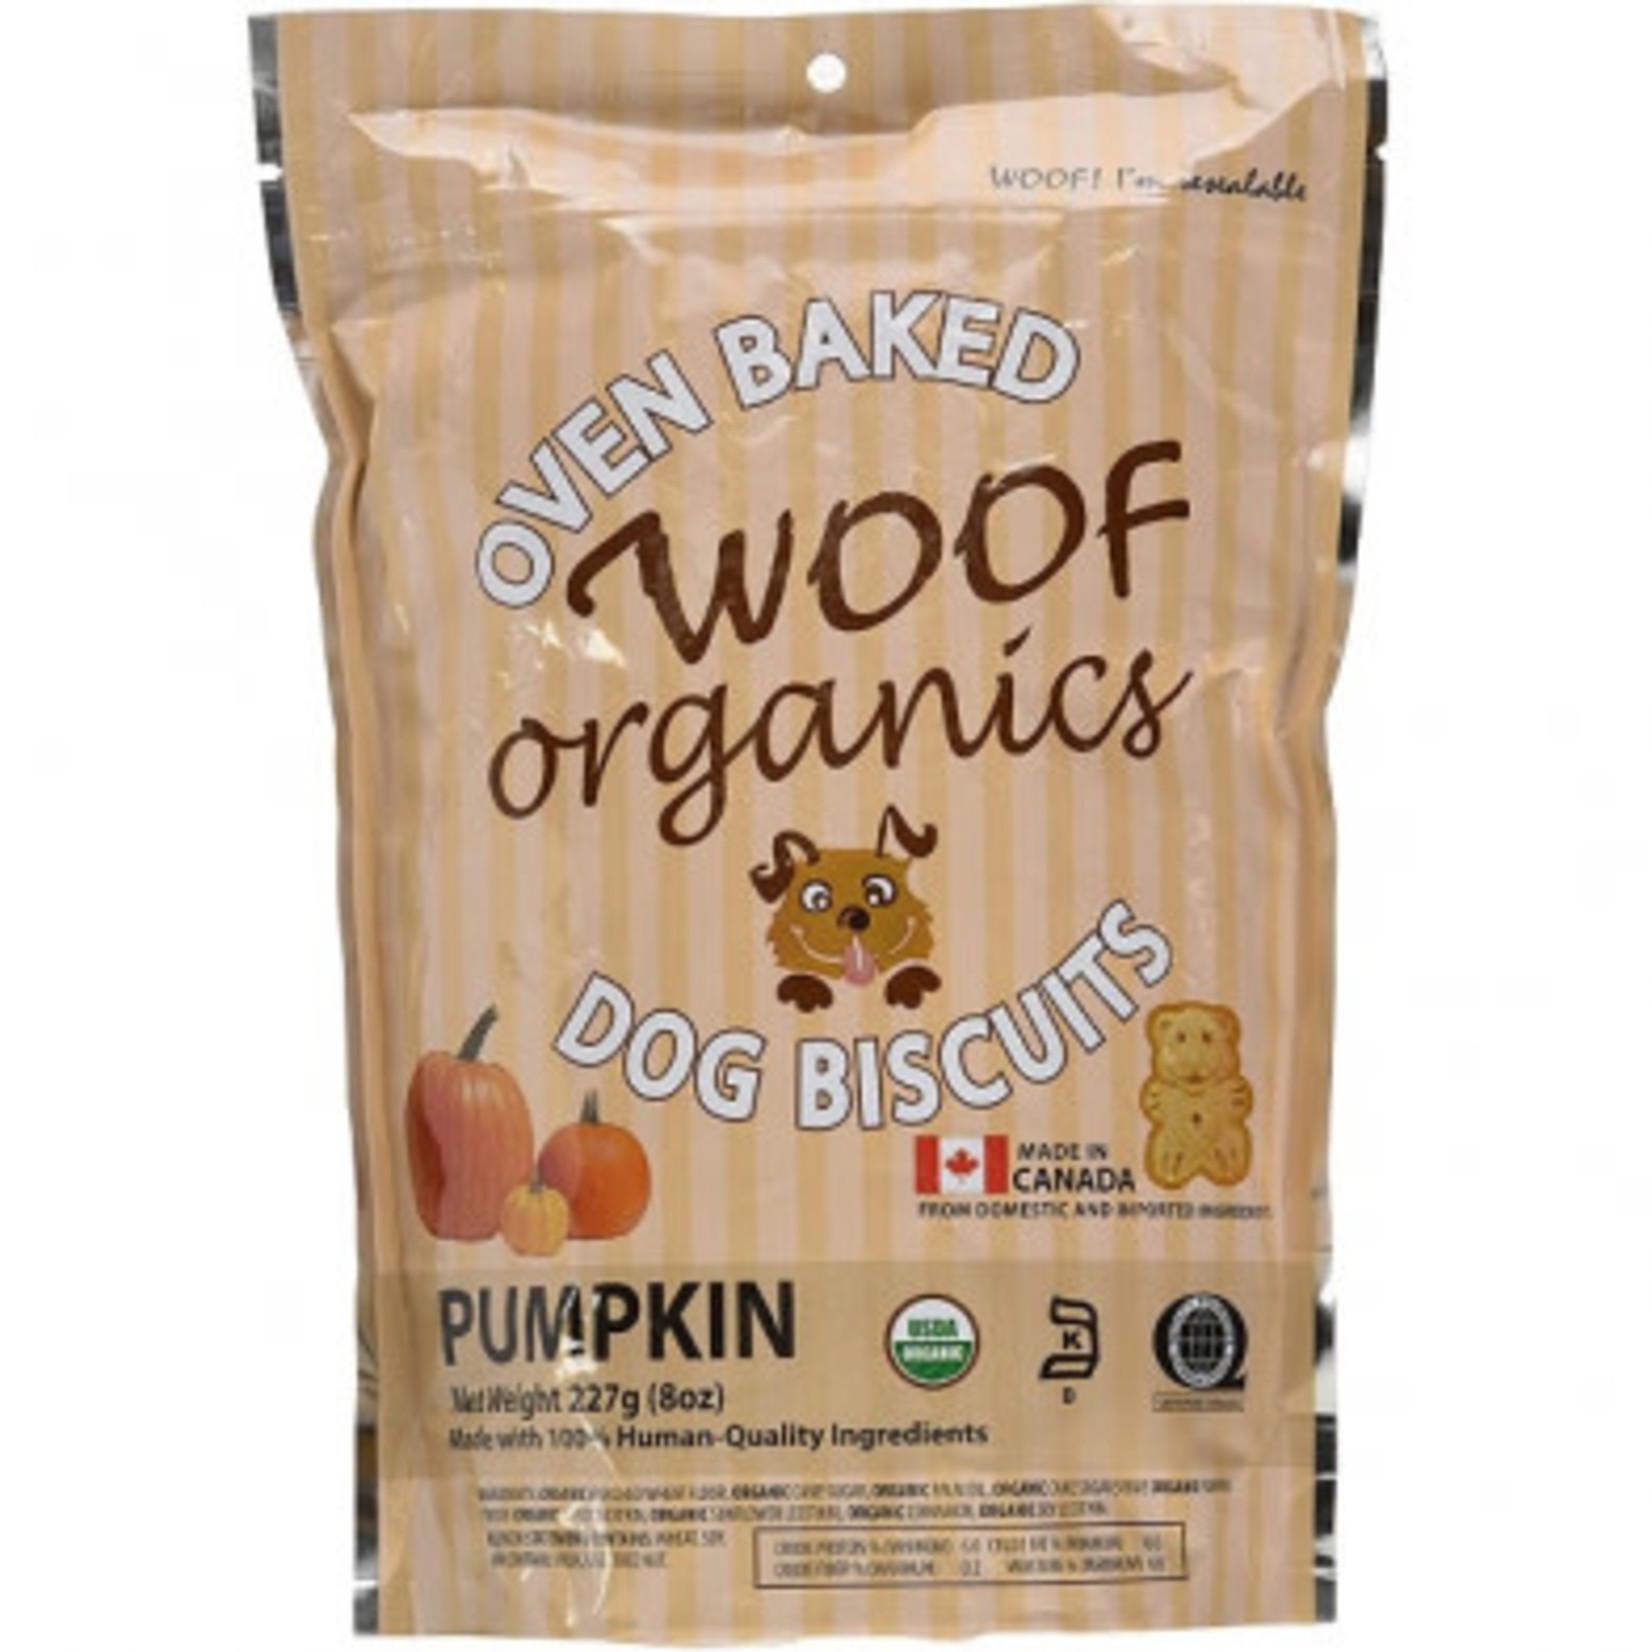 Woof Concept Organic Dog Biscuits Pumpkin 227 g